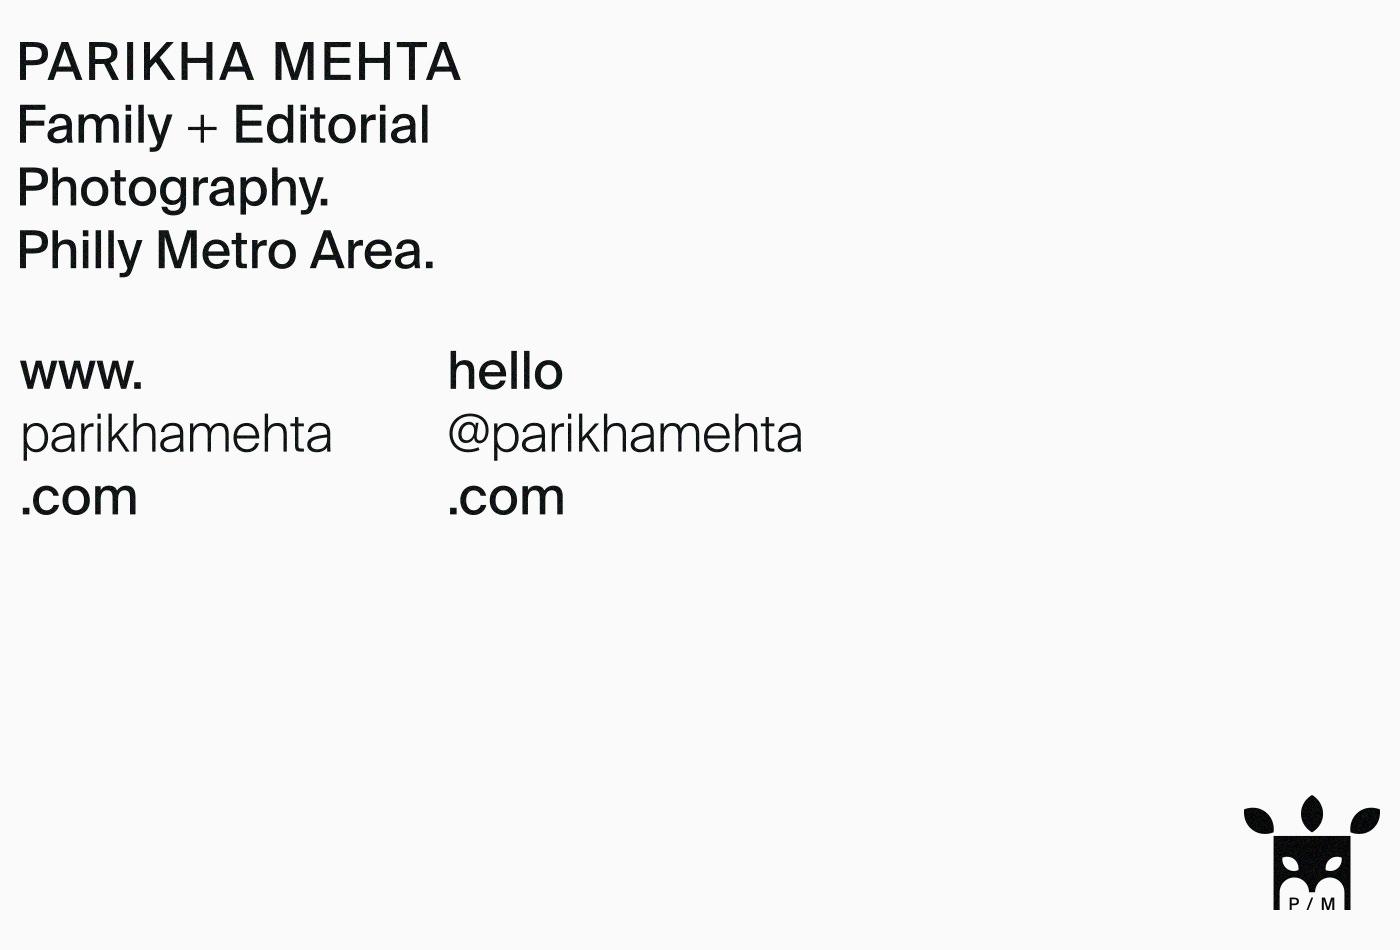 parikha-mehta-parikhamehta-photography-philadelphia-philly-family-editorial-pm-branding-brand-system-letterhead-invoice-vacaliebres-typeface